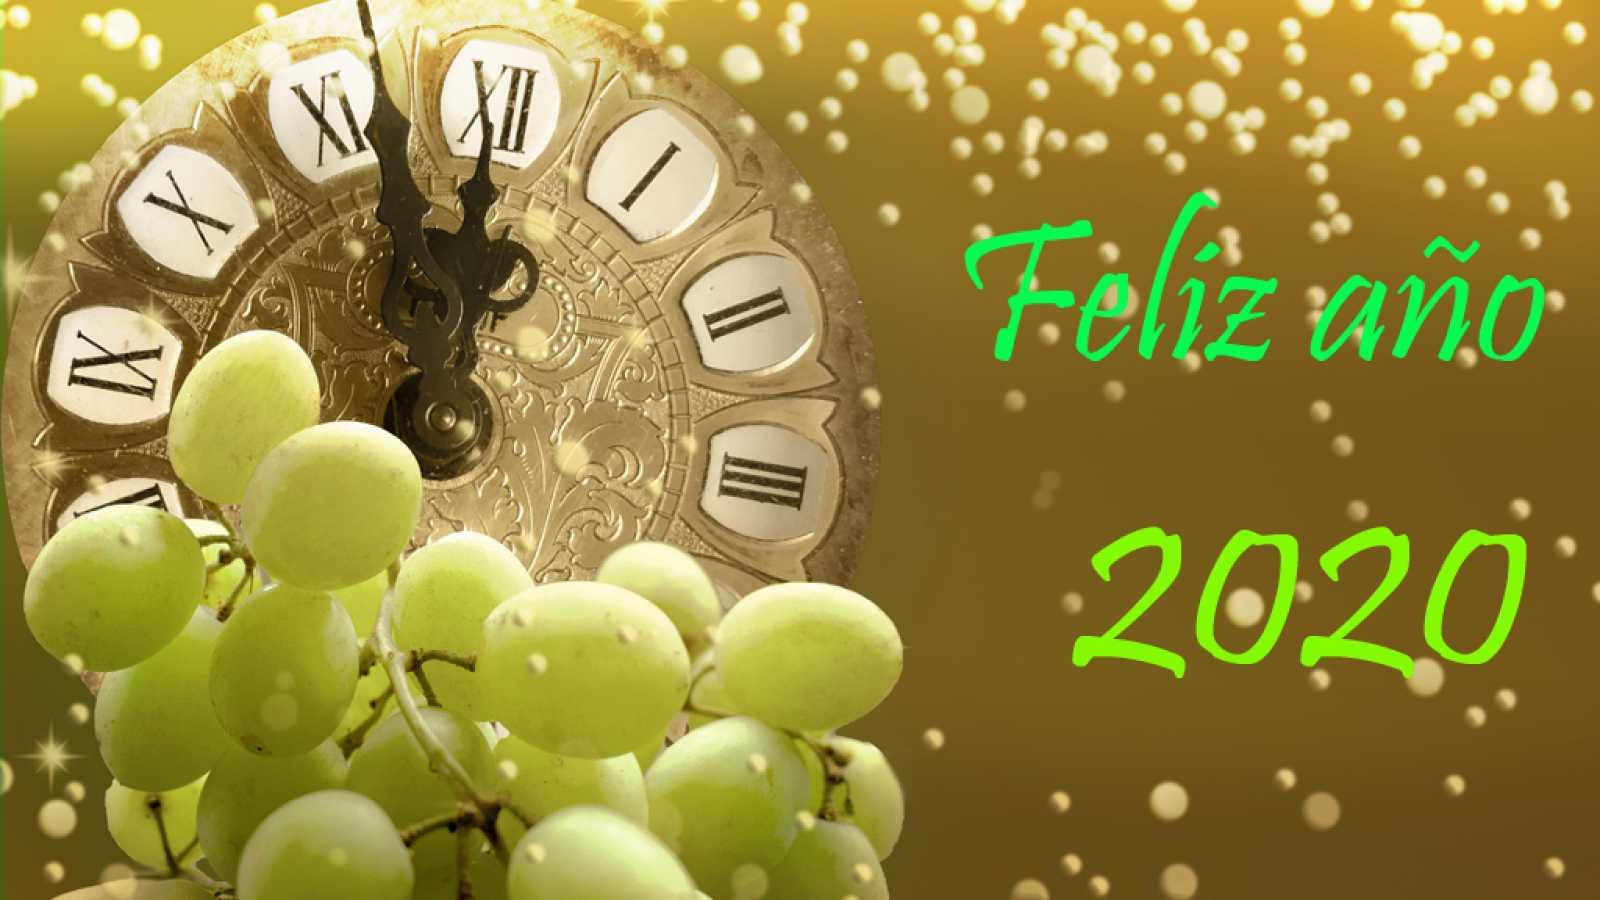 Feliz Ano 2020 Familia unida es mi deseo. feliz ano 2020